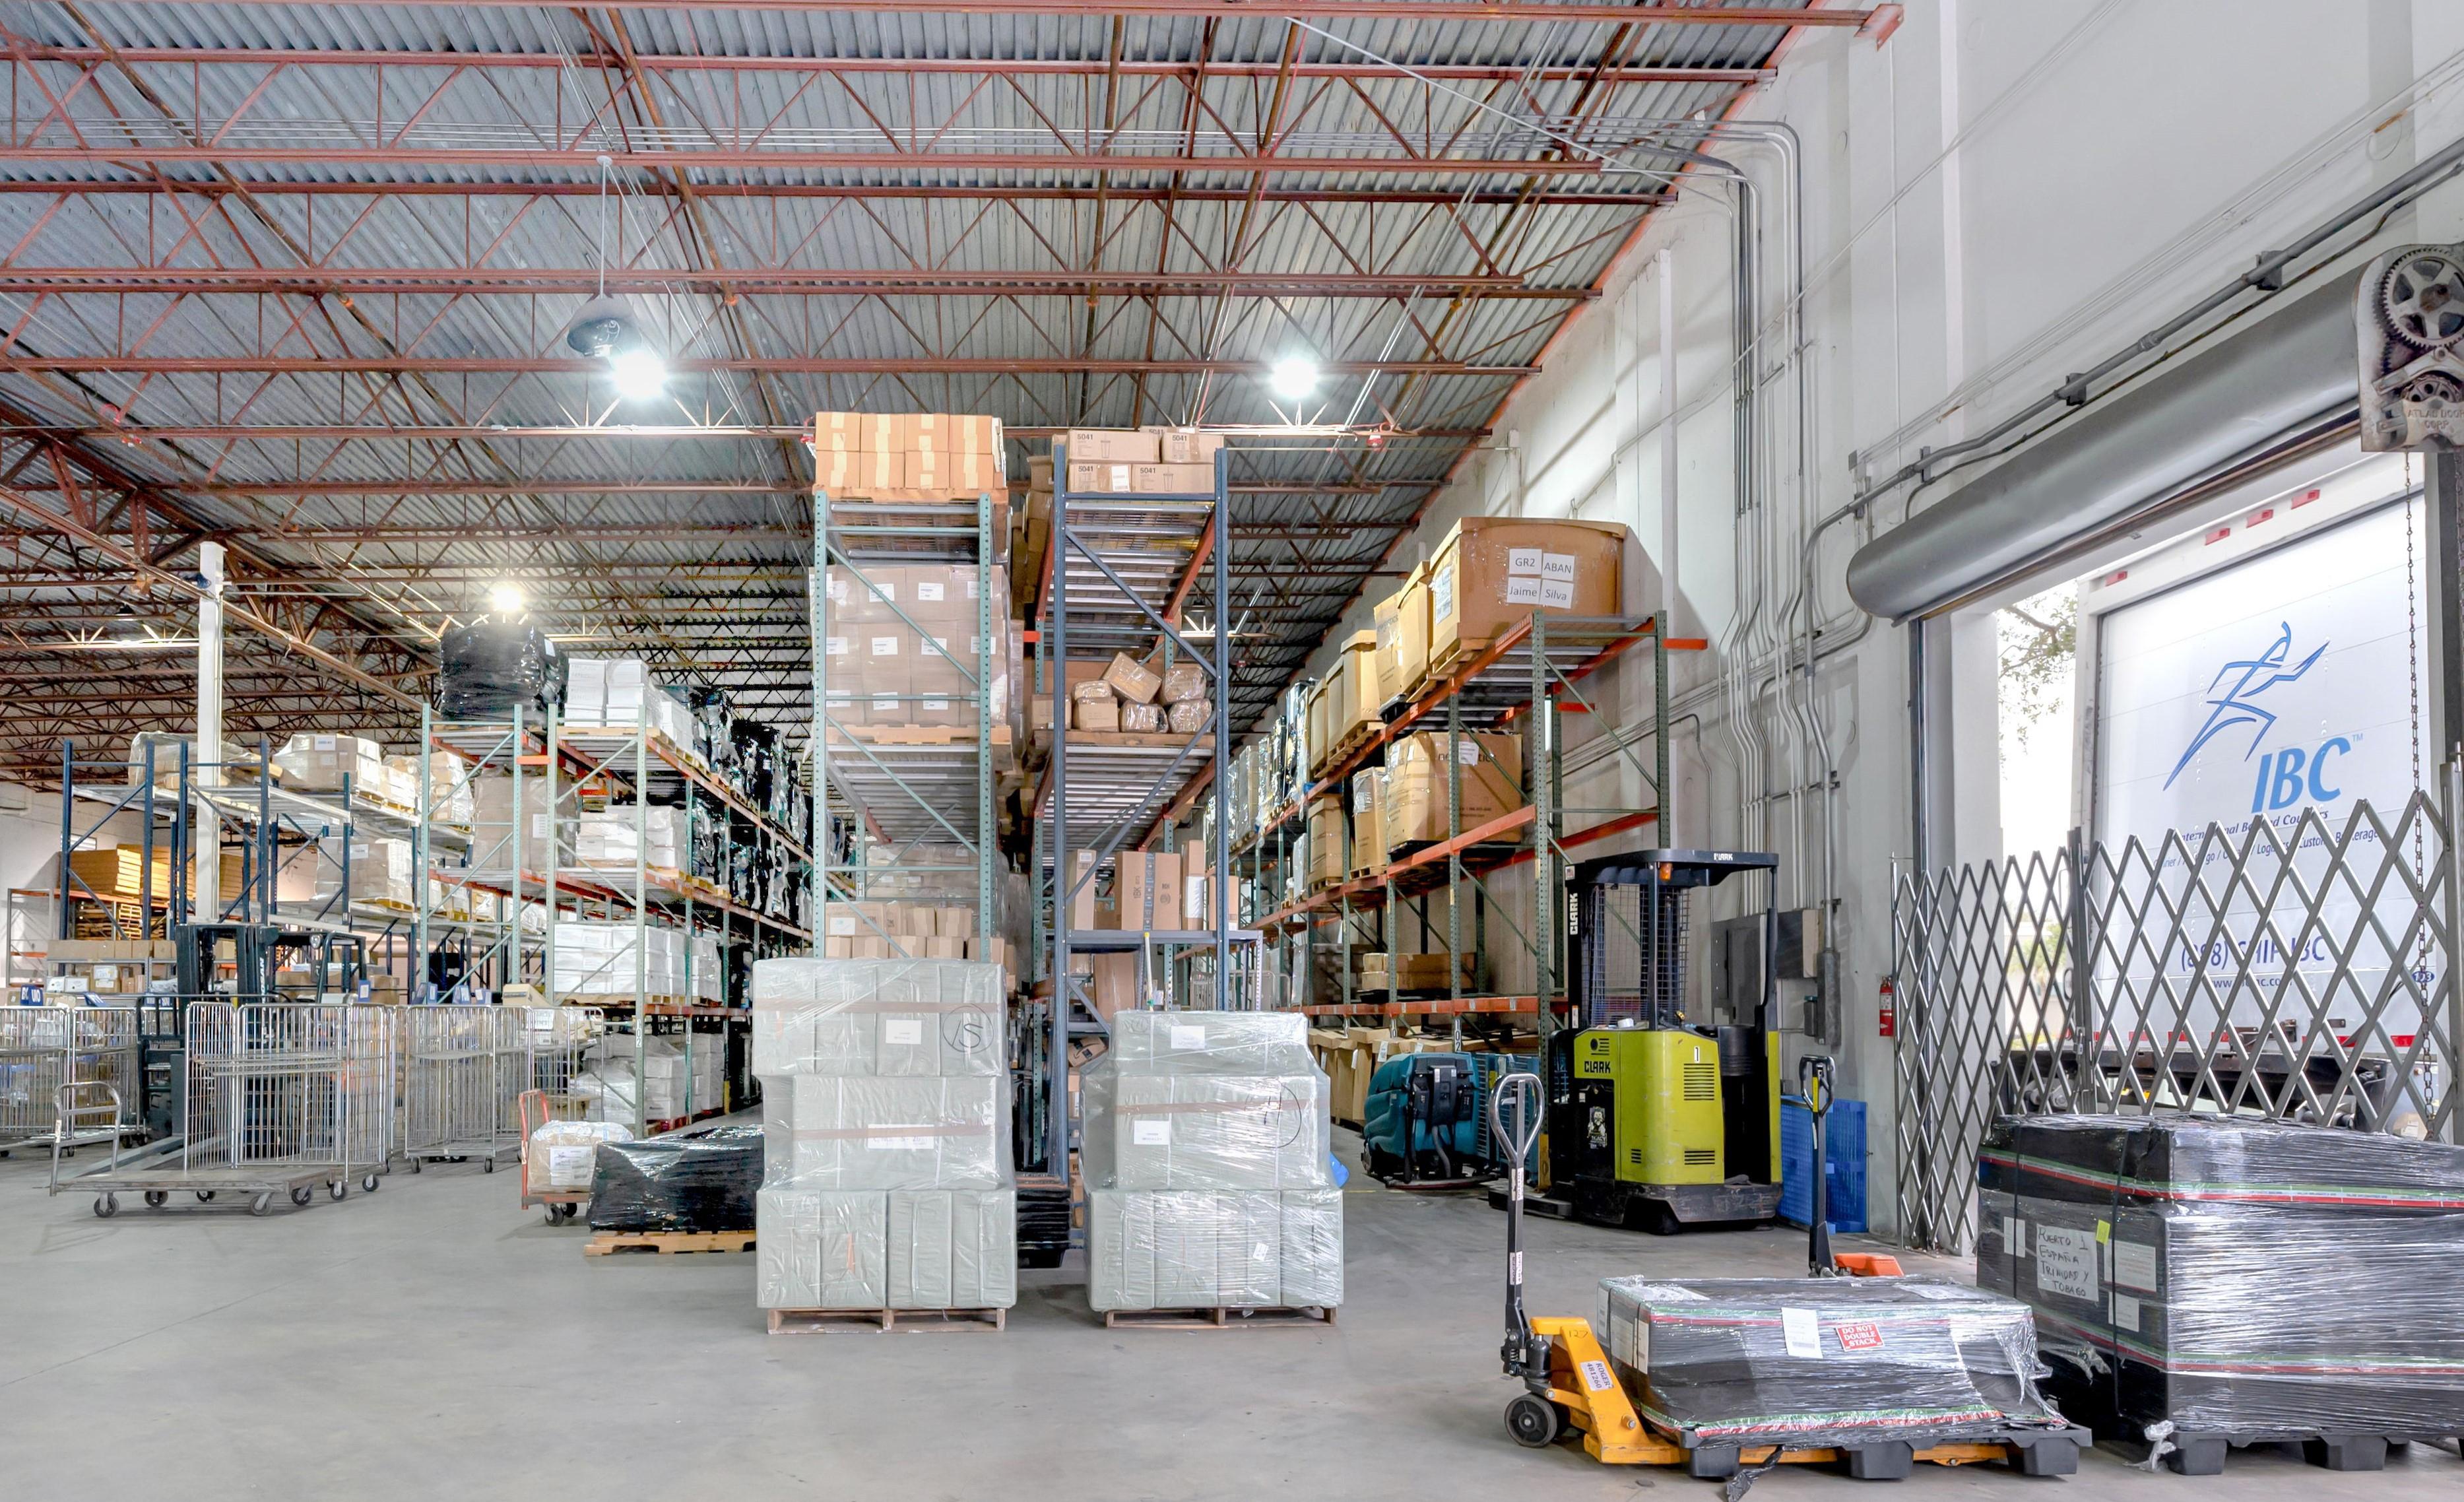 IBC-Warehouse3